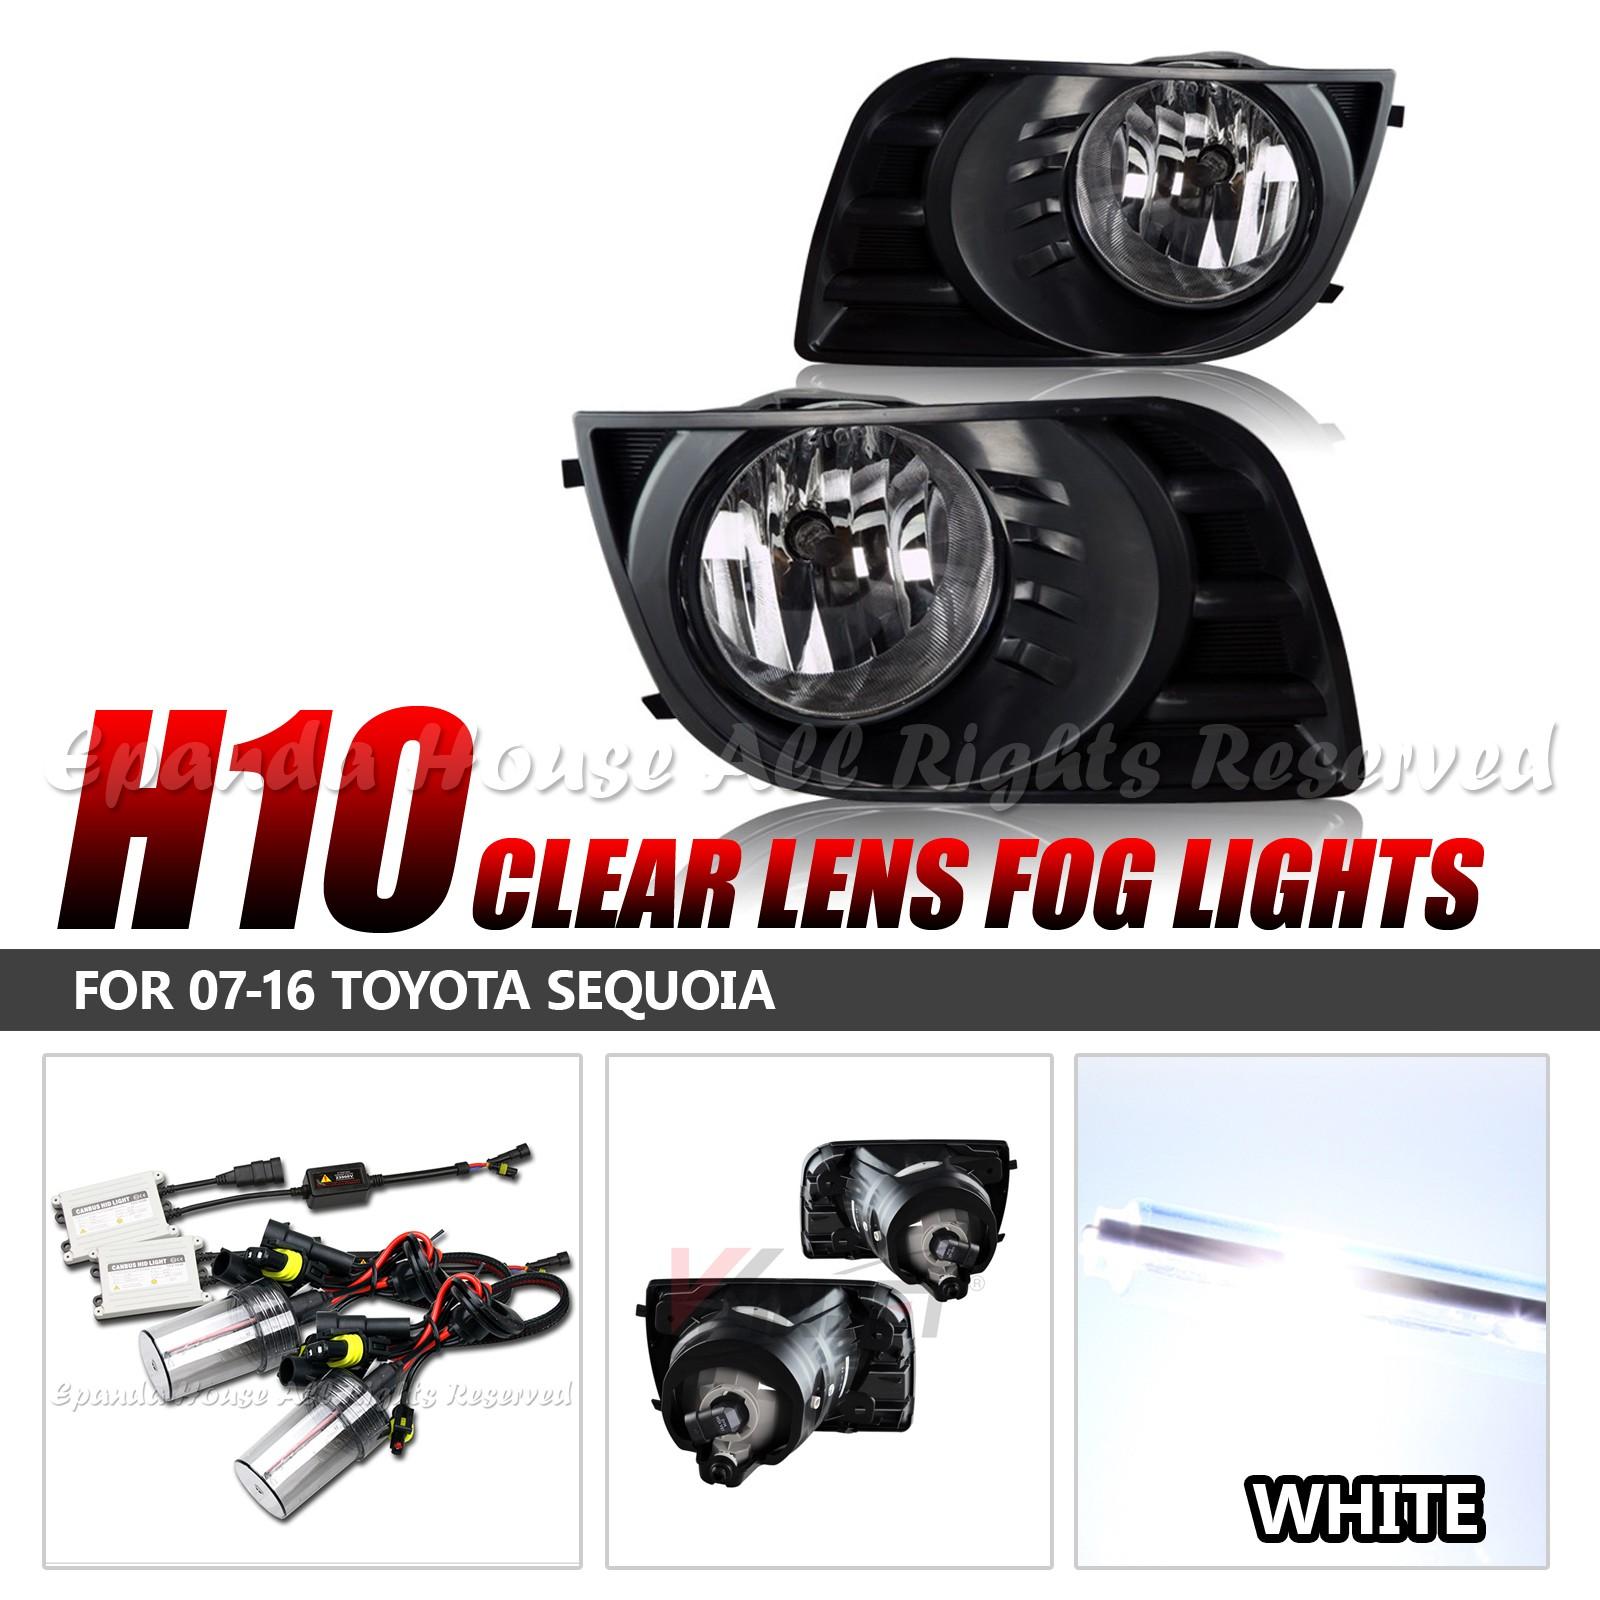 Para-07-16-Toyota-Sequoia-Lentes-Transparentes-Faros-Antiniebla-Asambleas-6000k